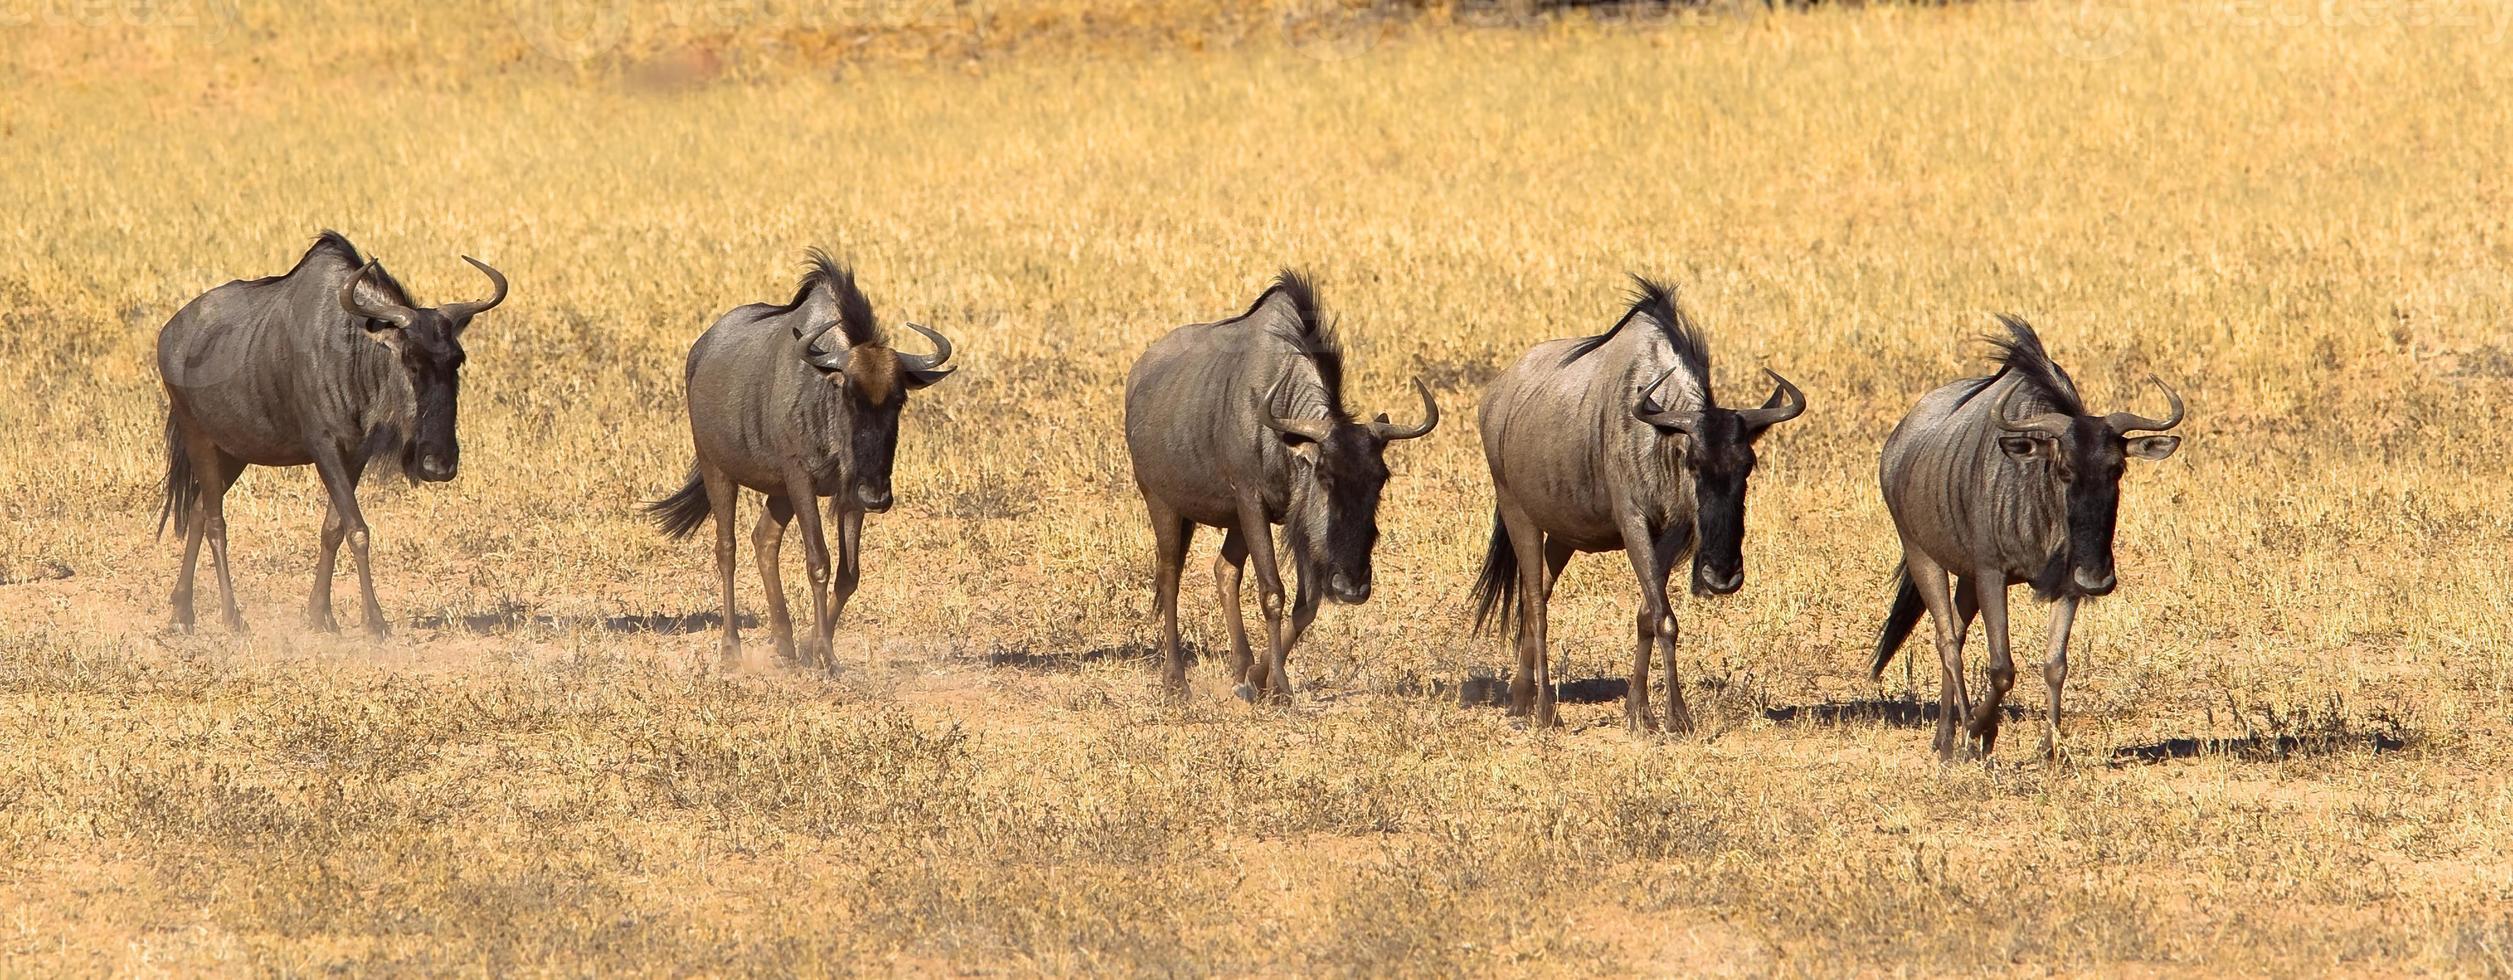 GNU andando na fila foto